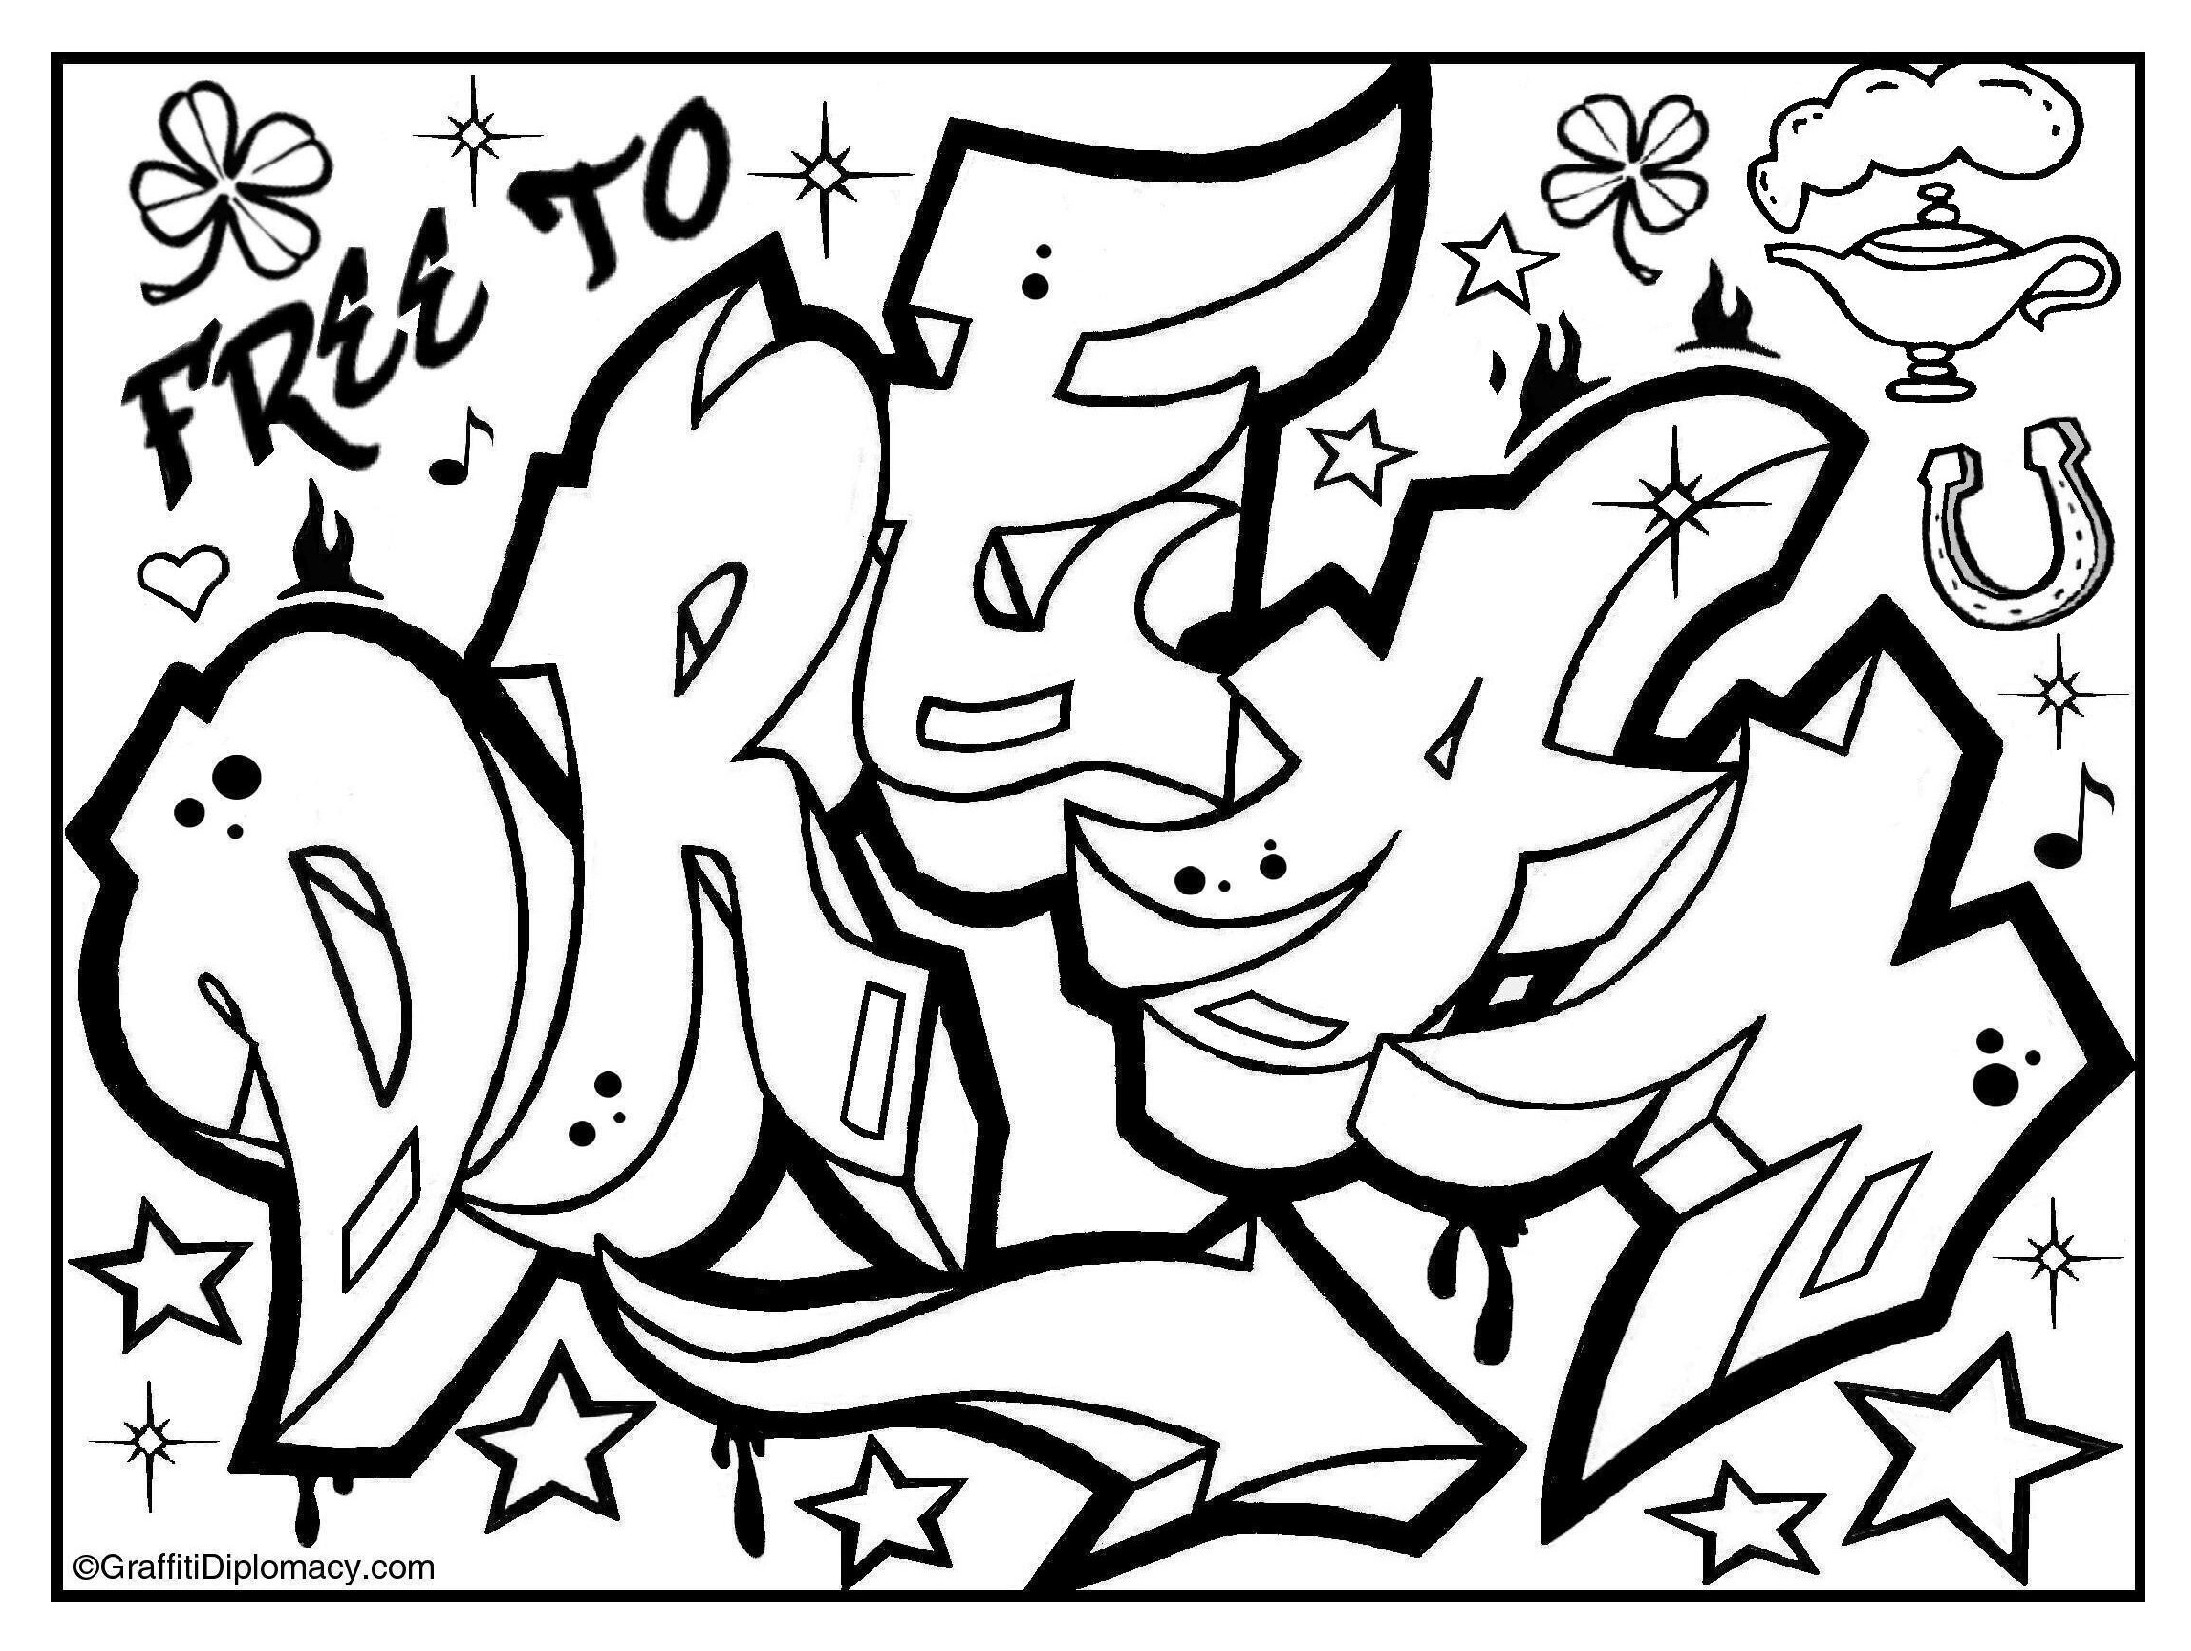 2191x1651 How To Draw Graffiti Book